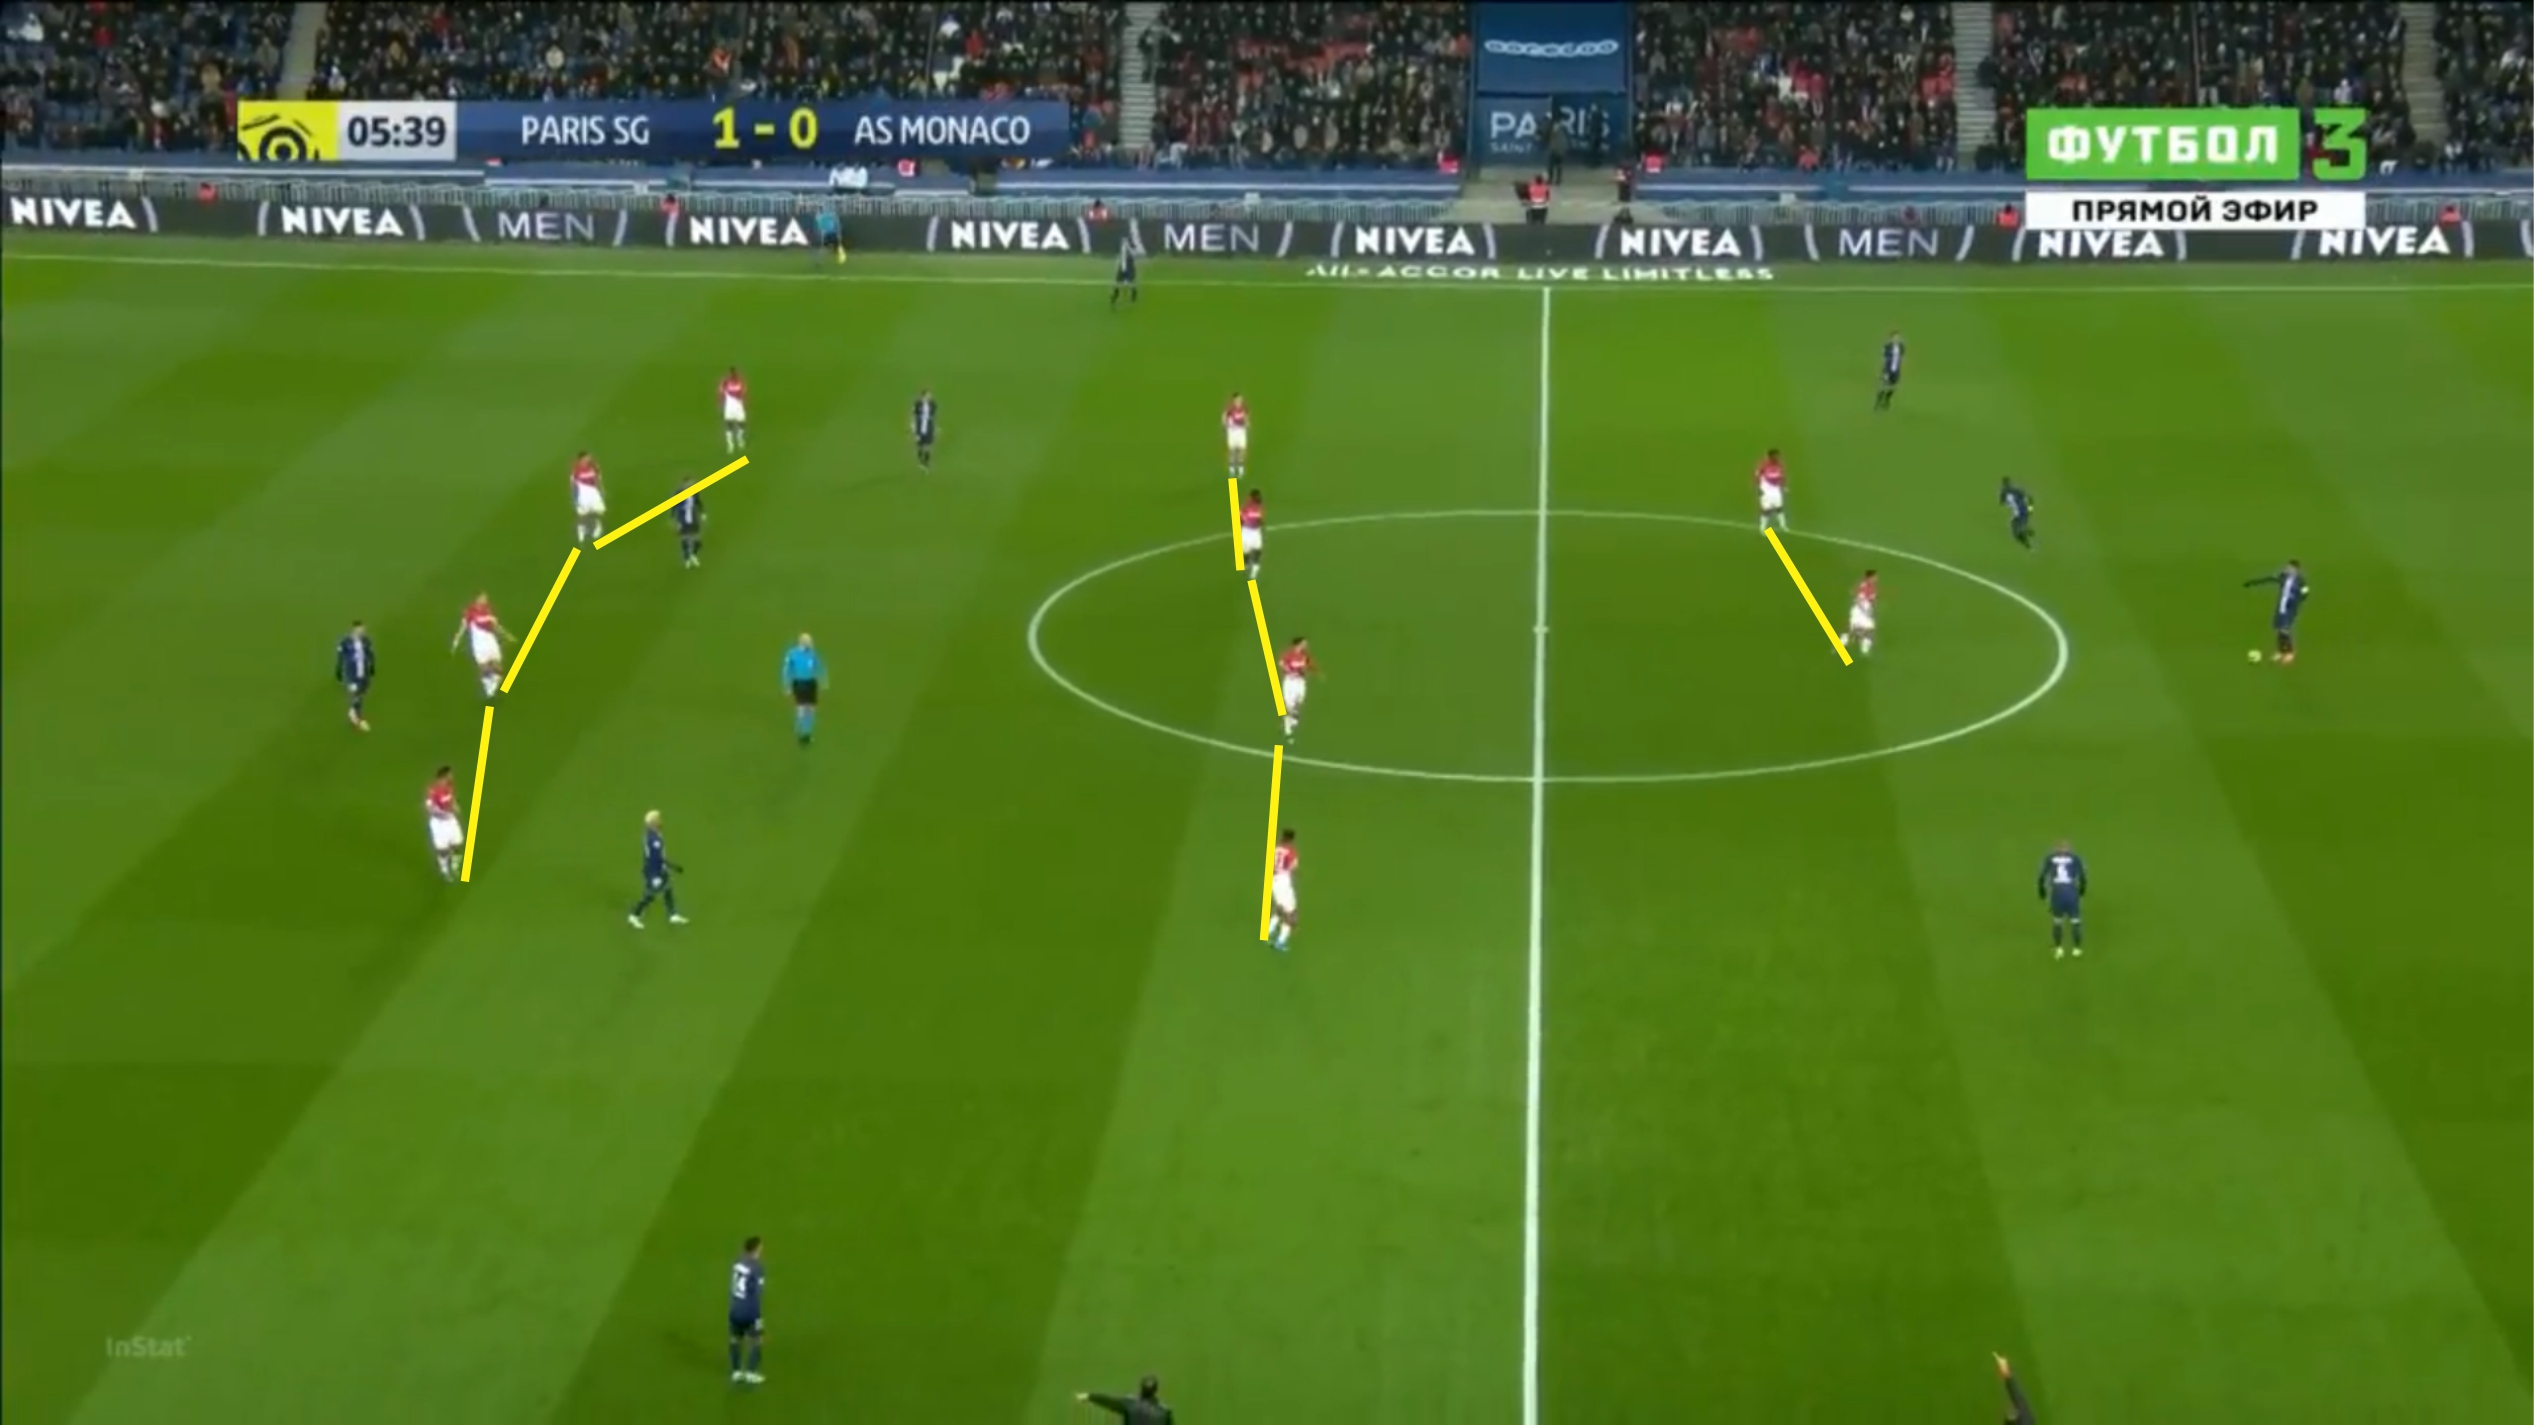 Ligue 1 2019/20: Paris Saint-Germain vs Monaco - tactical analysis tactics